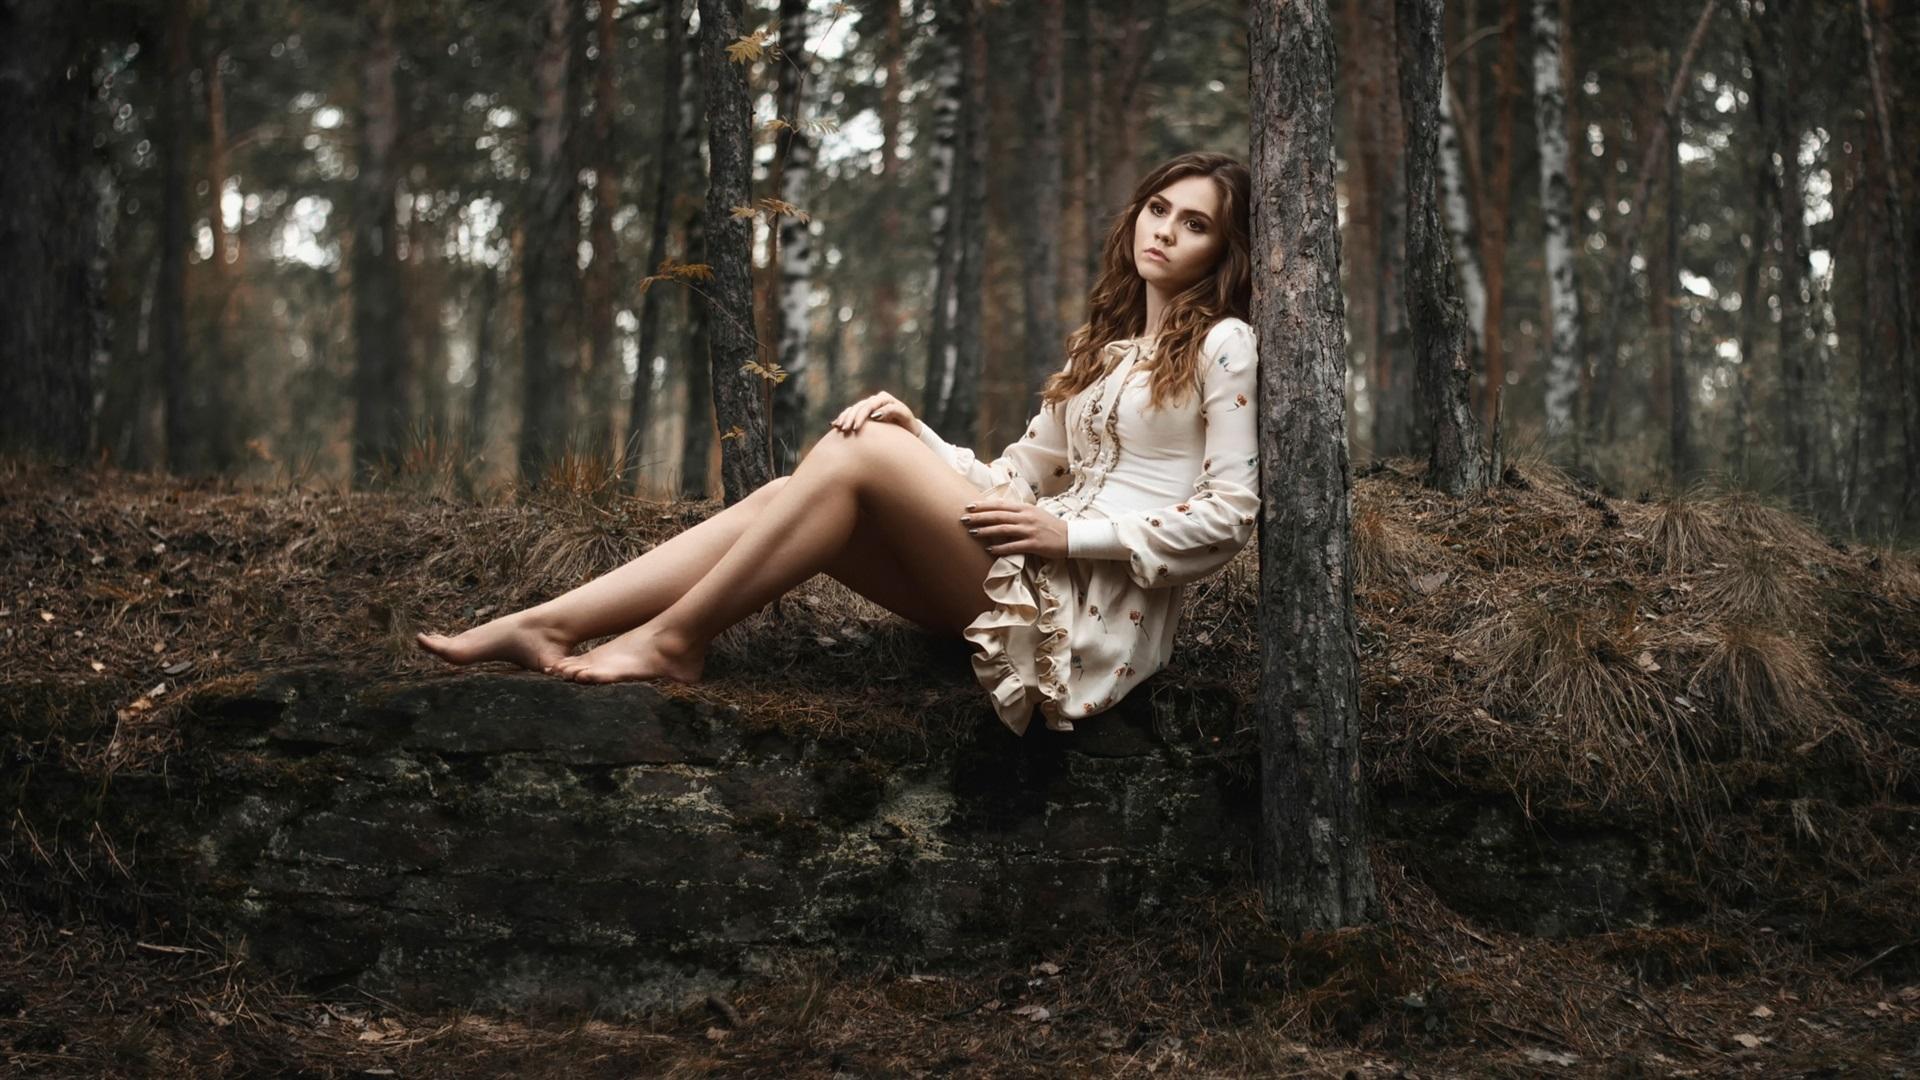 отдалась лесу девка в